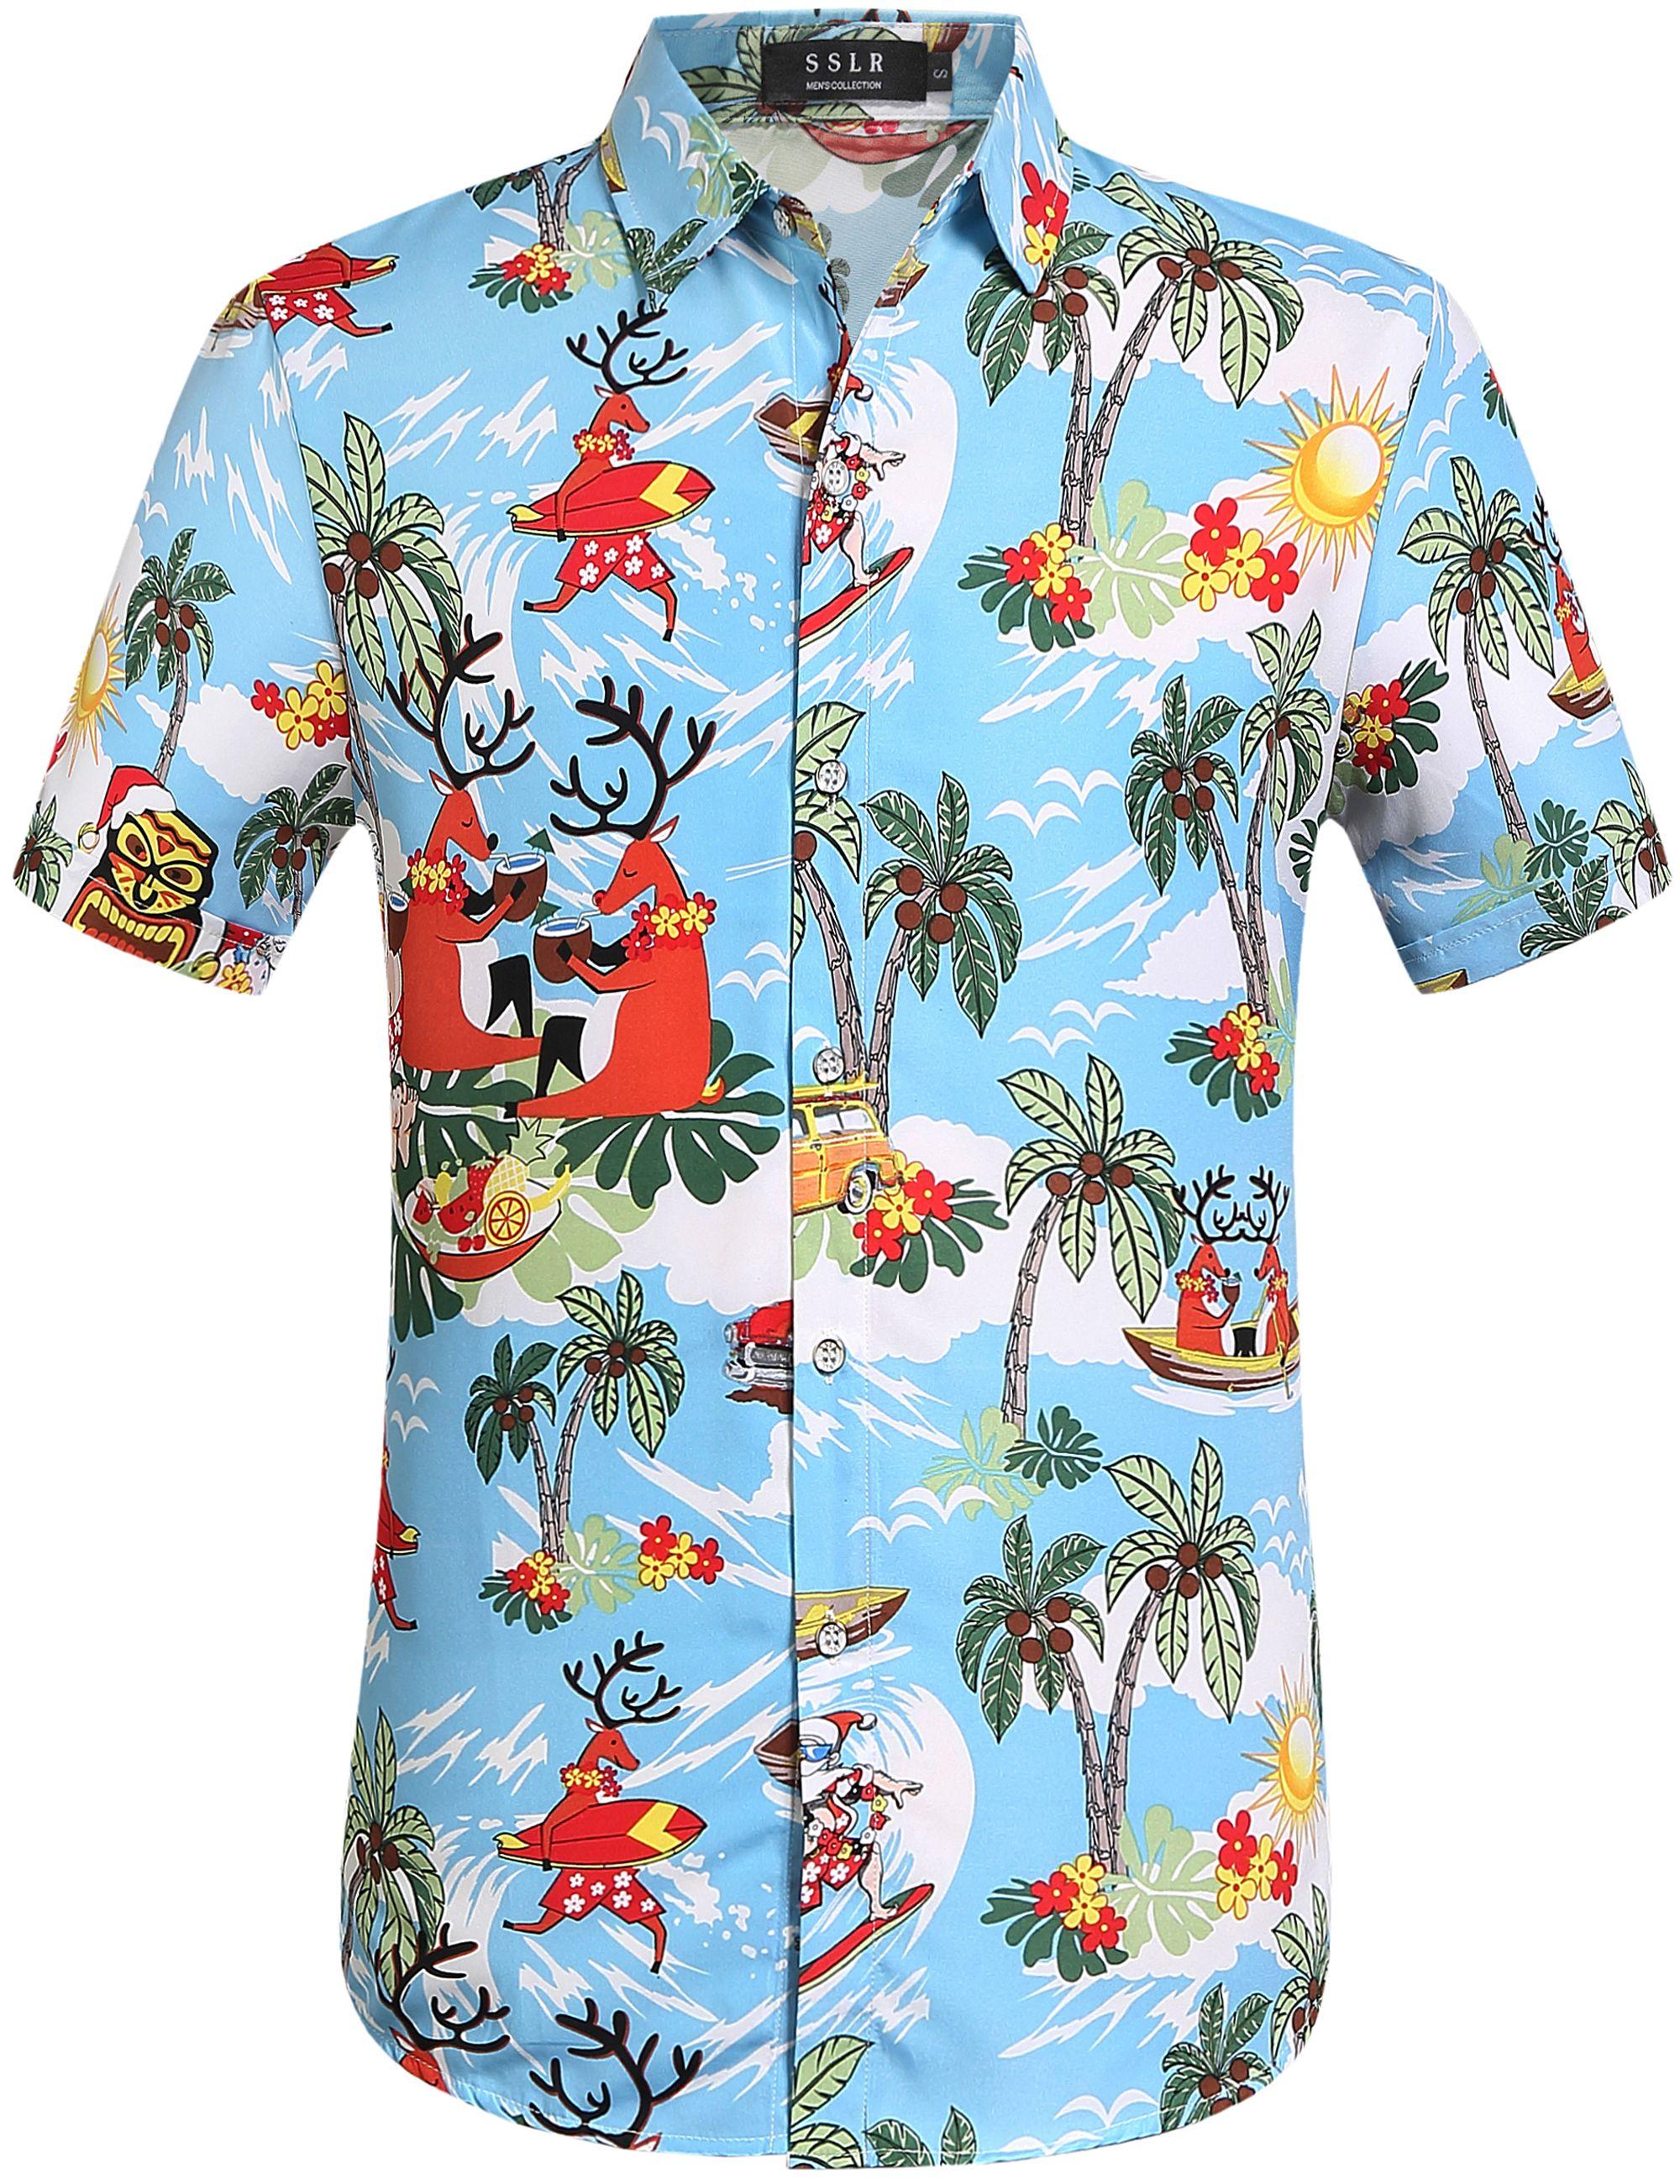 2463dfa68 SSLR Reindeer Hawaiian Shirt #Holiday style #Aloha Shirt #Christmas party